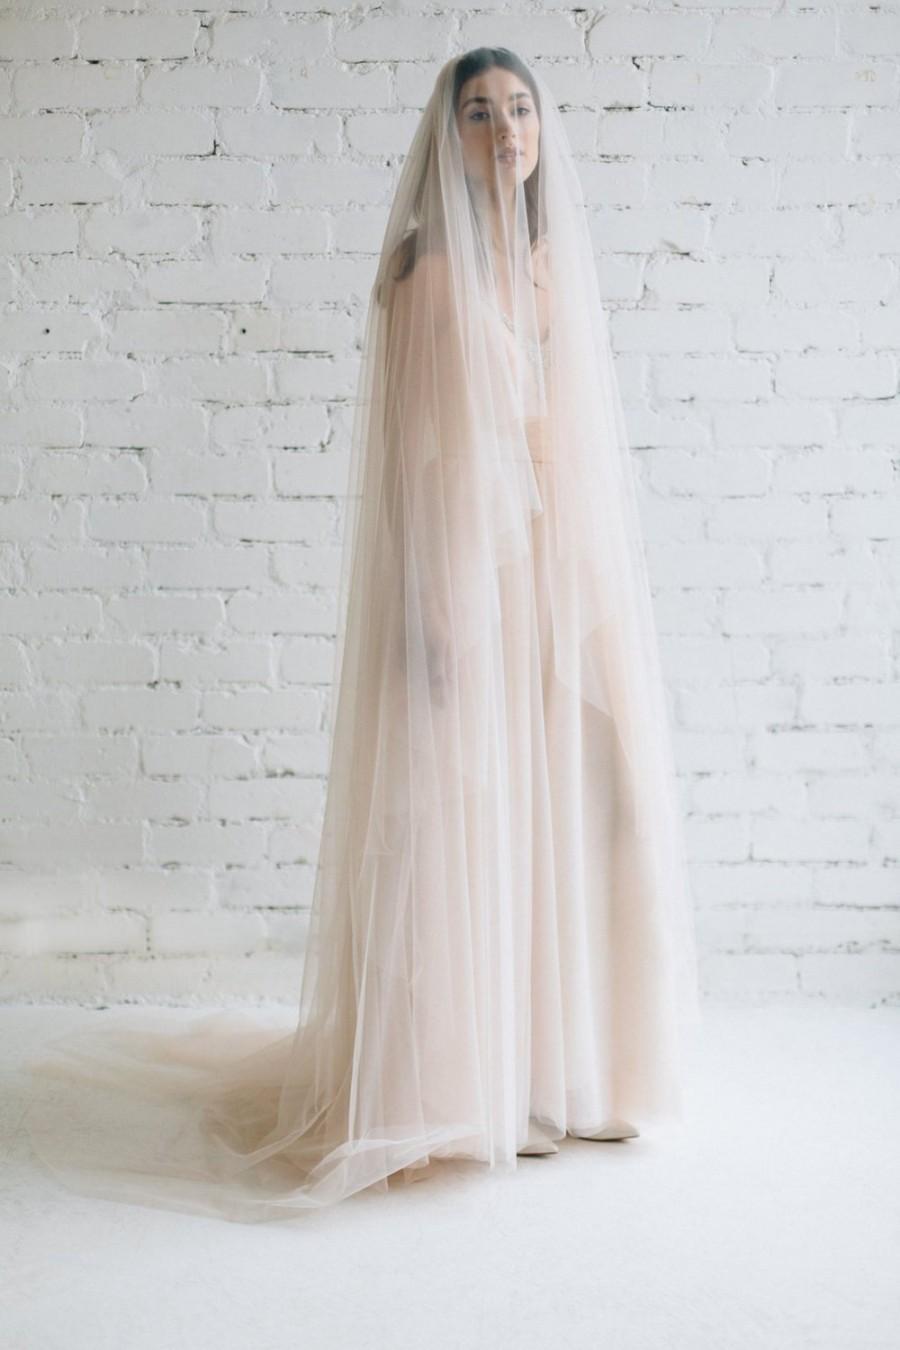 Hochzeit - Blush Wedding Veil, Cathedral Veil , Wide Tulle Veil, Veil with Blusher ,Circle Drop Veil, Blusher Veil, Long Tulle Veil -  JULIA